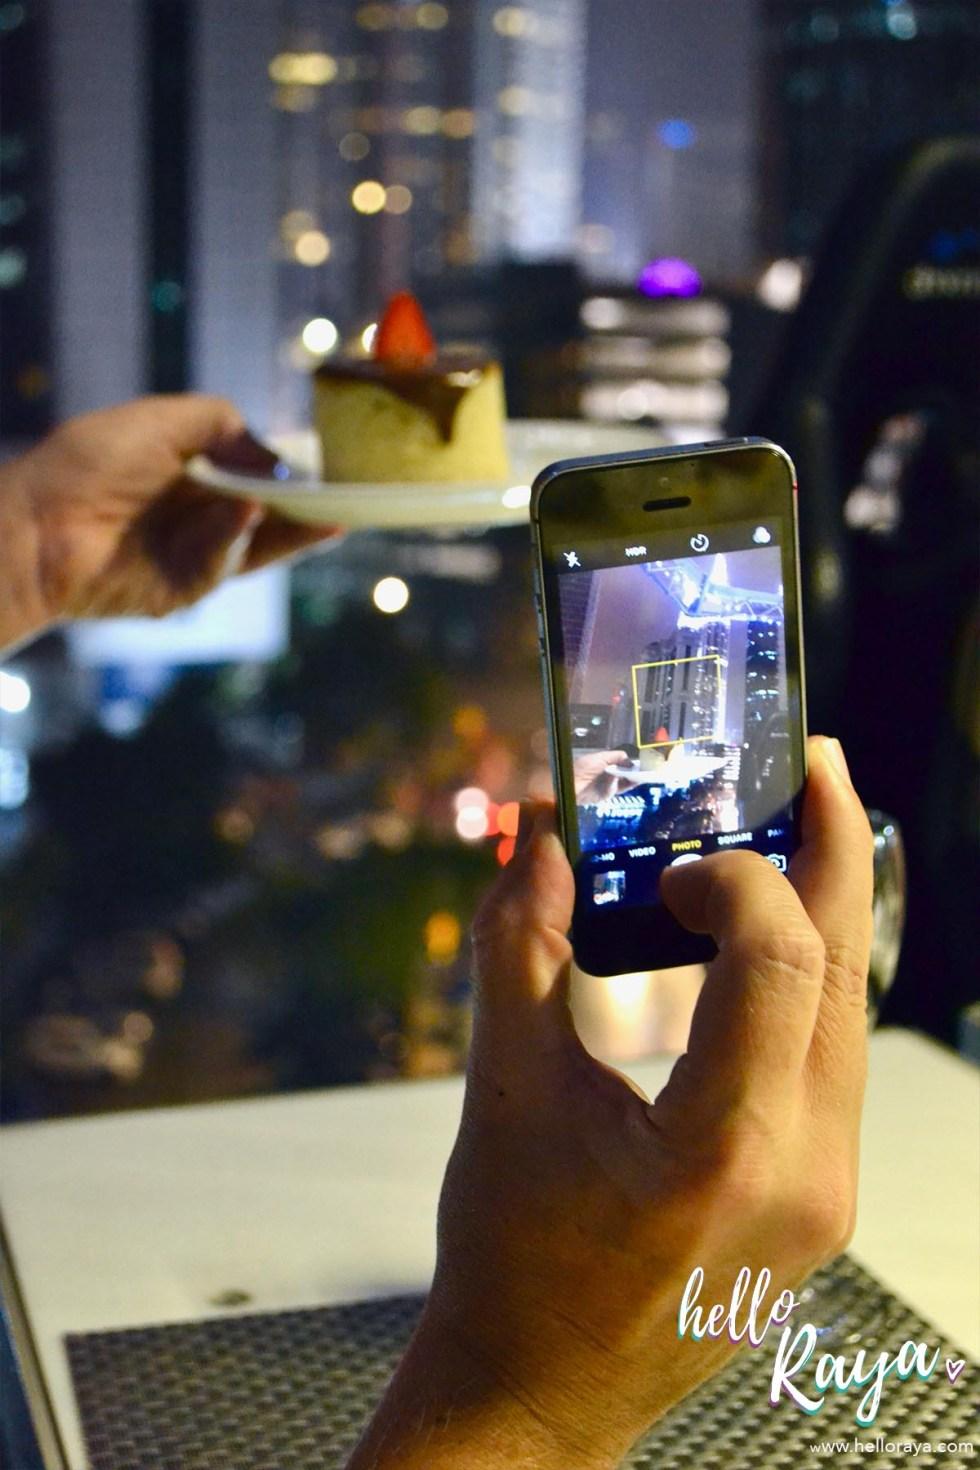 Dinner in the Sky Malaysia - Taking Photos | Hello Raya Blog